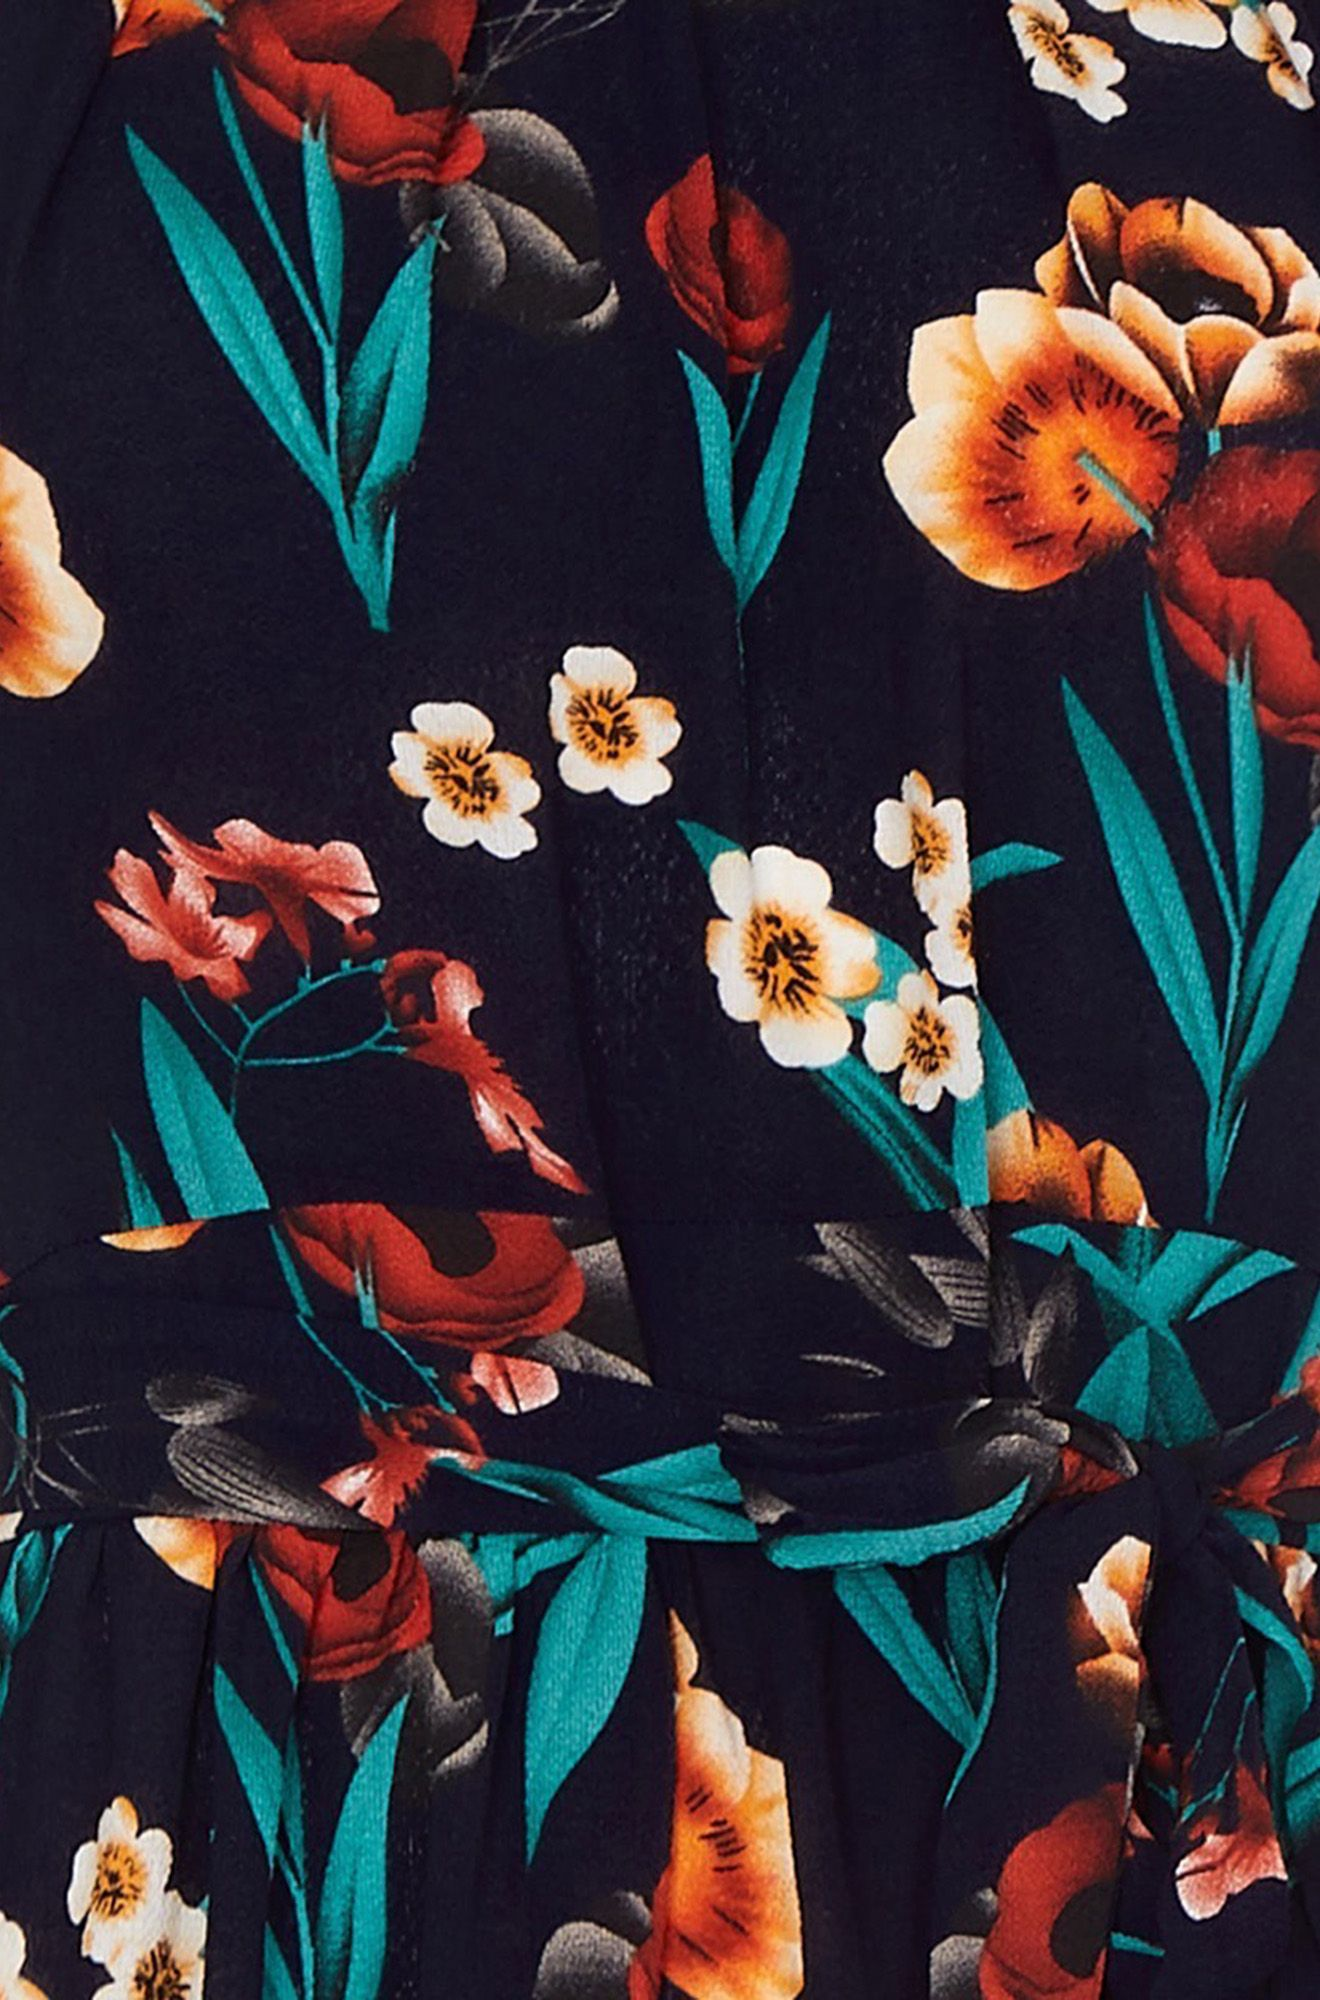 Black Poppy Print High Neck Maxi Dress